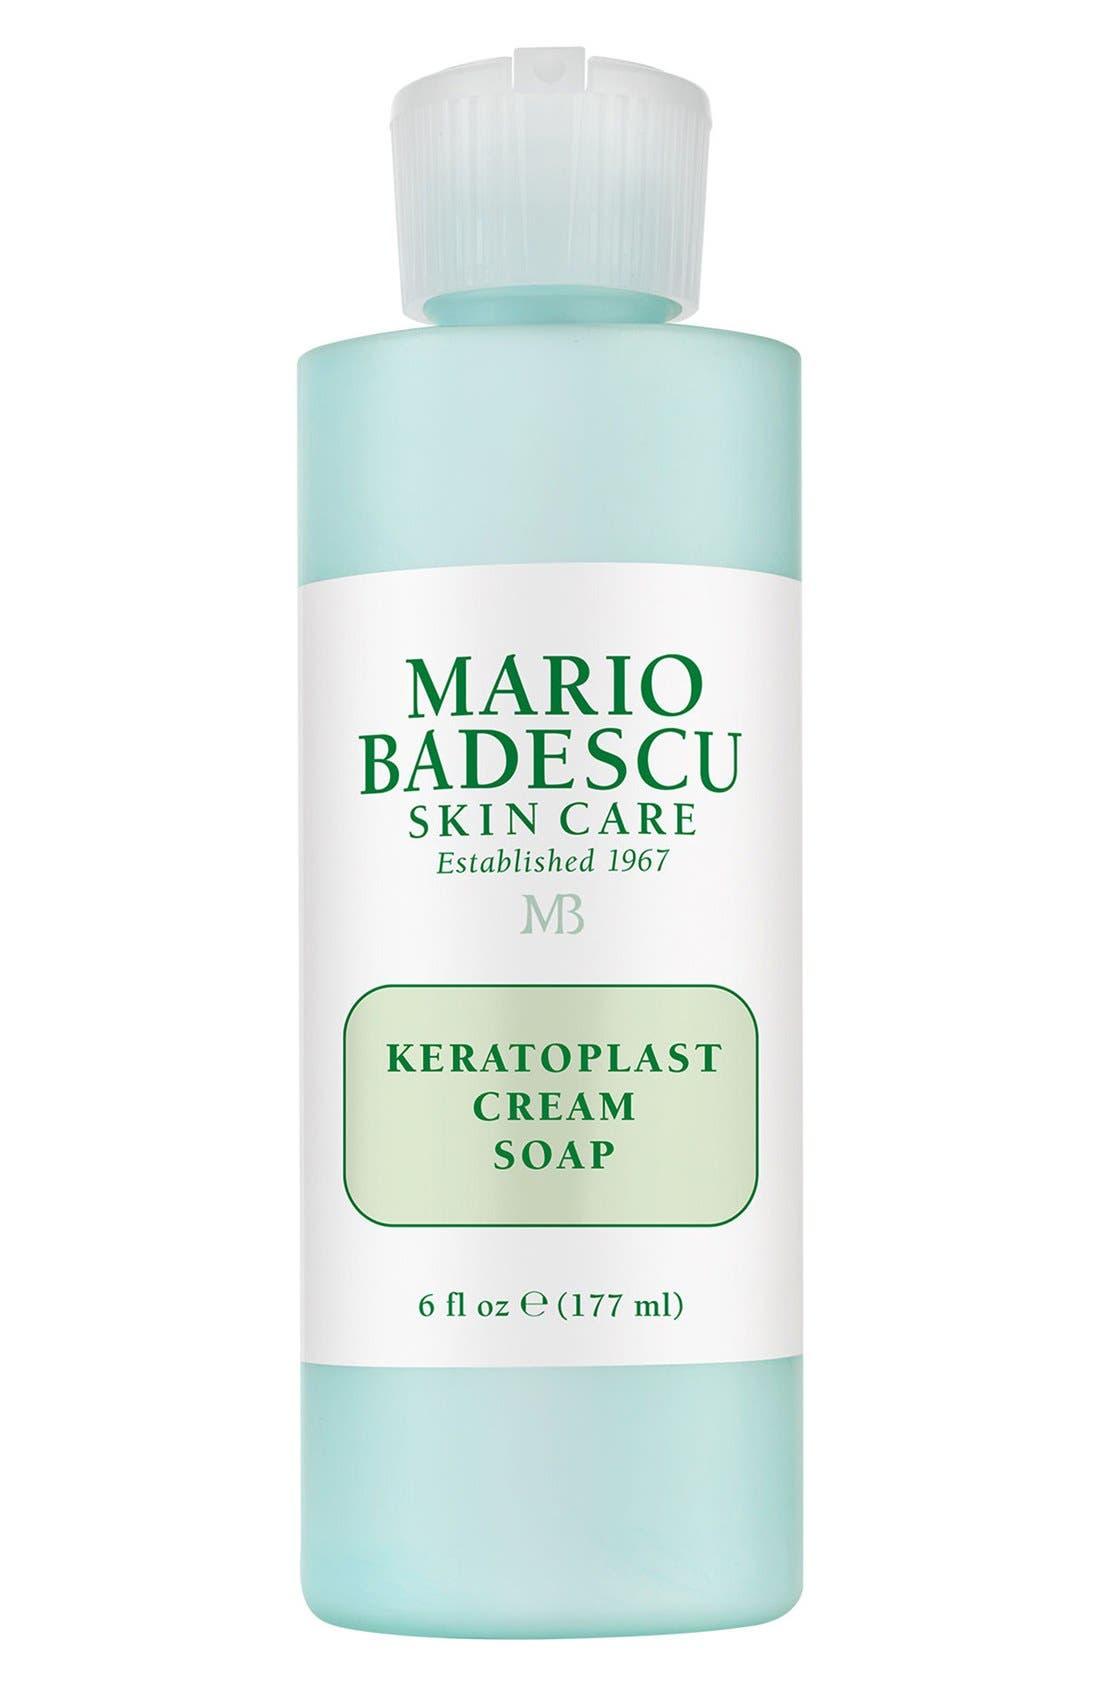 'Keratoplast' Cream Soap,                             Main thumbnail 1, color,                             NO COLOR